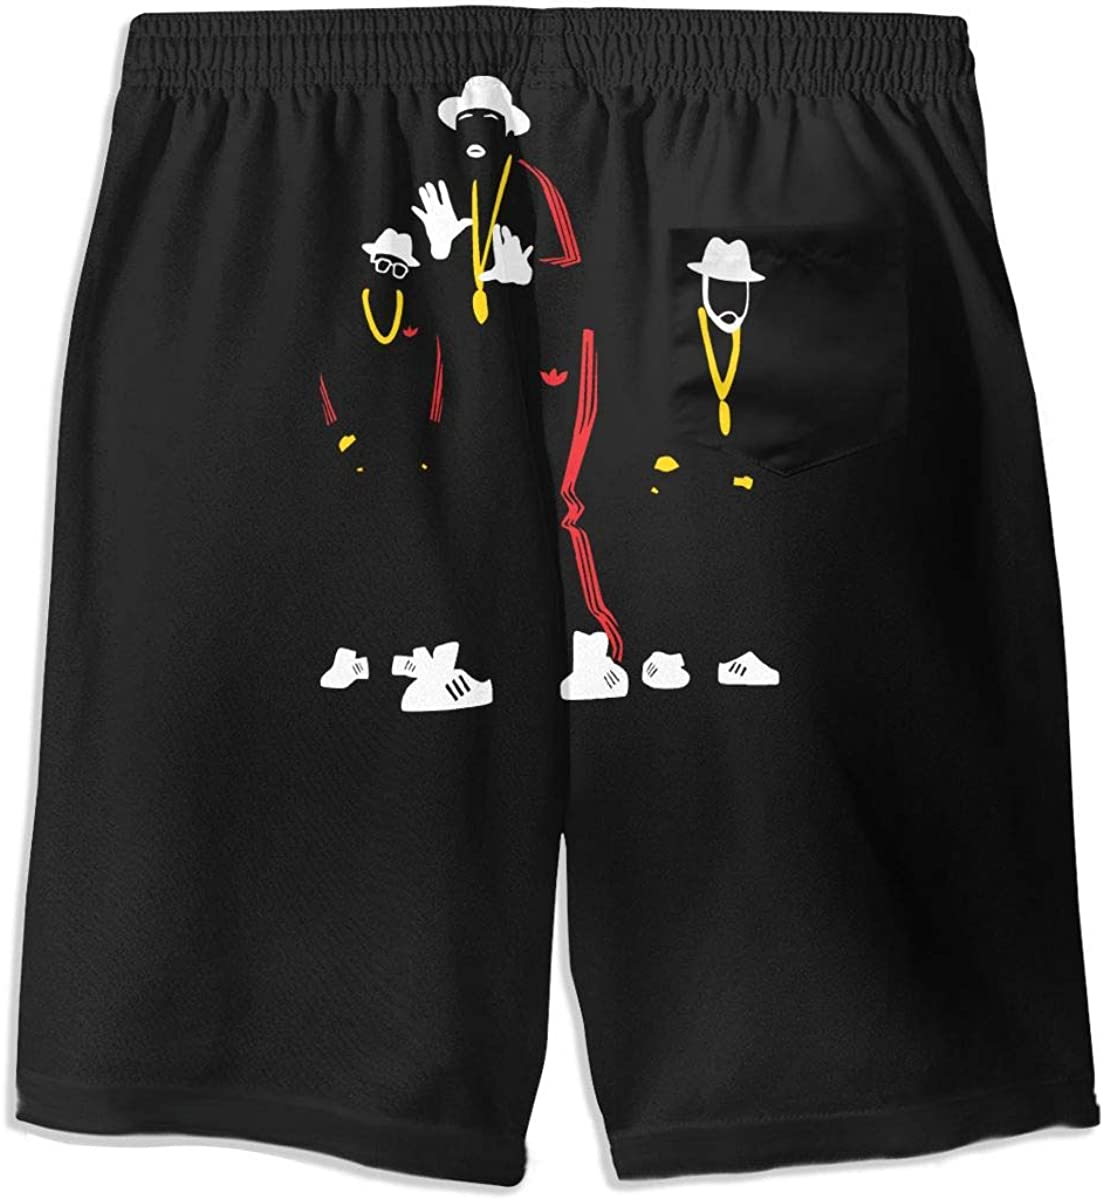 Nothing Better Than Hip Hop Music Teenager Boys Beachwear Beach Shorts Pants Board Shorts